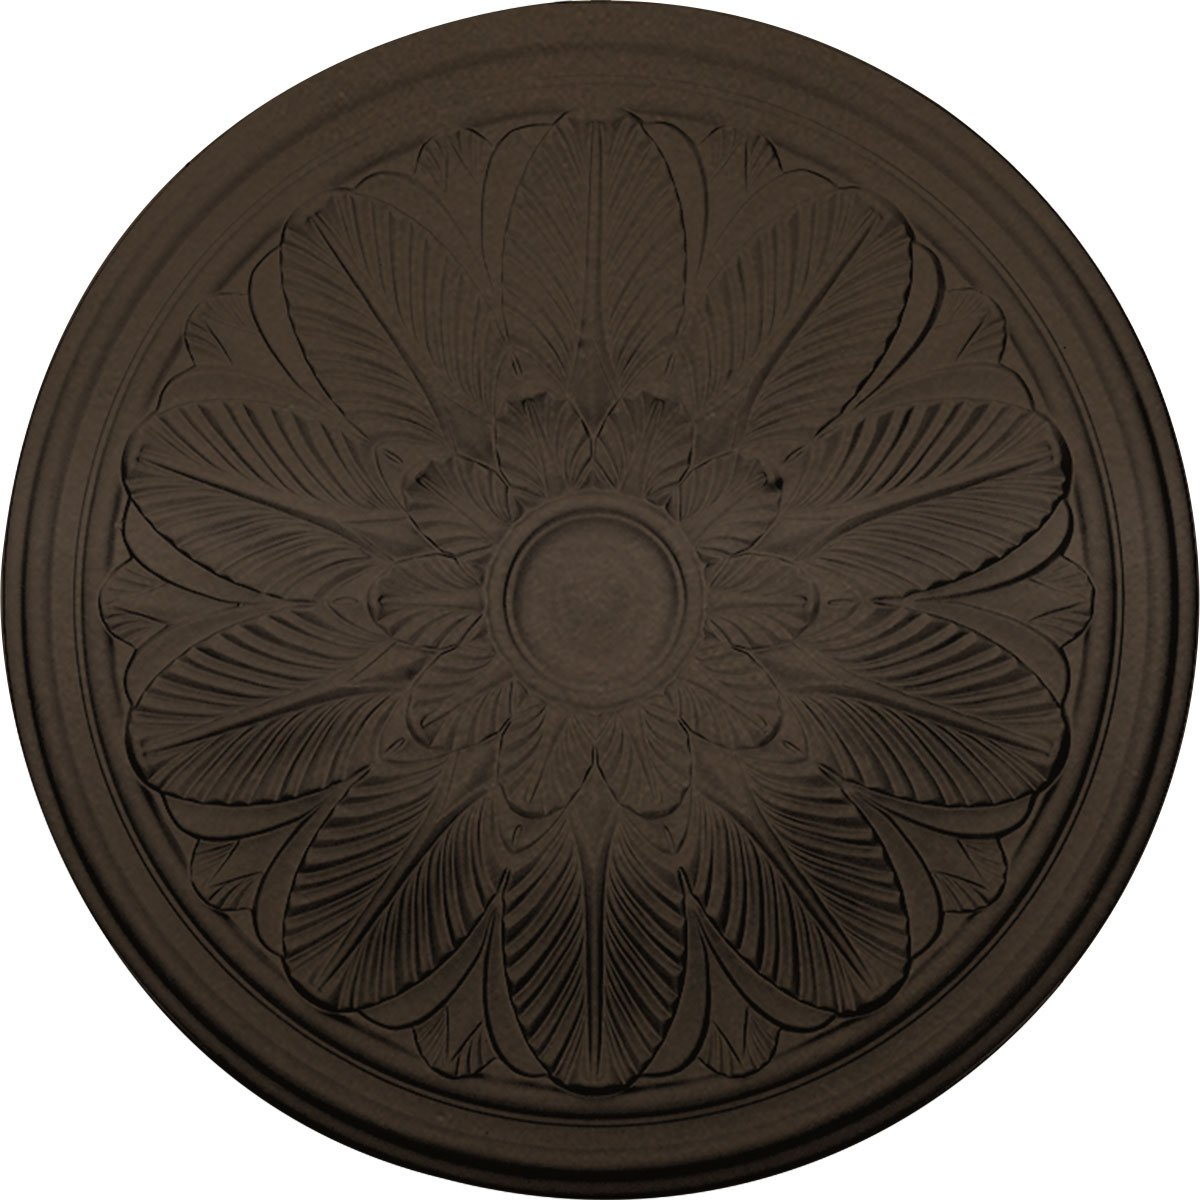 Ekena Millwork CM22BOBZS 22 5/8'' OD x 1 3/4'' P Bordeaux Ceiling Medallion fits Canopies up to 3 1/4'', Bronze